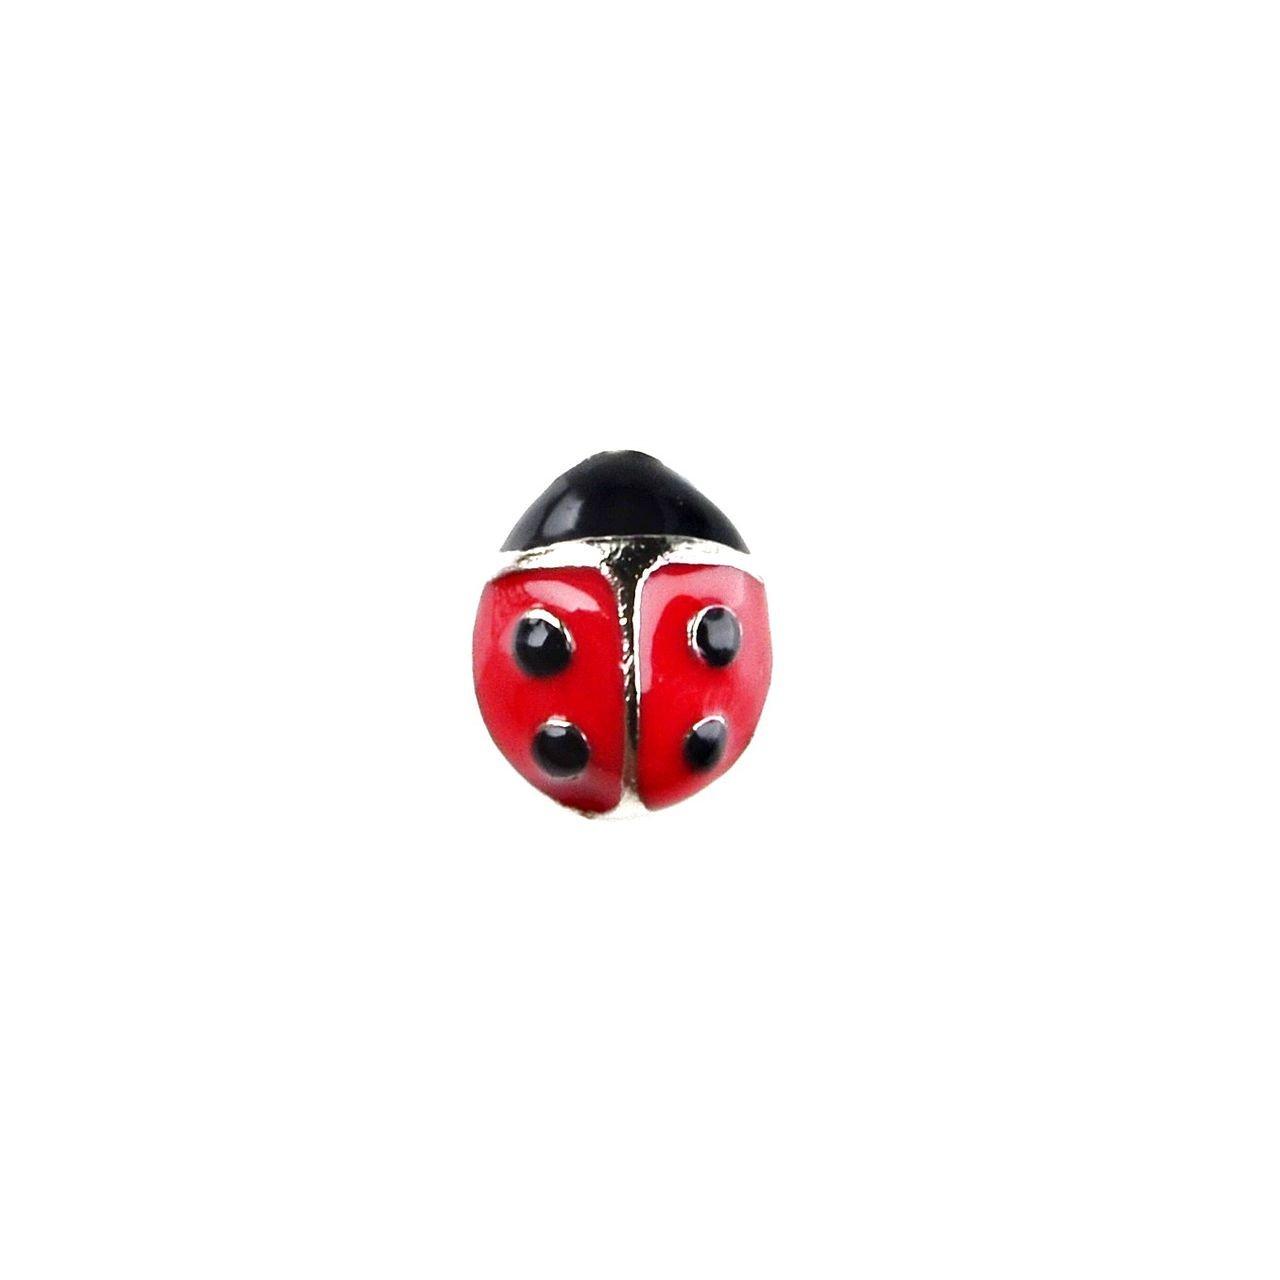 Quality Handcrafts Guaranteed Ladybug Lapel Pin